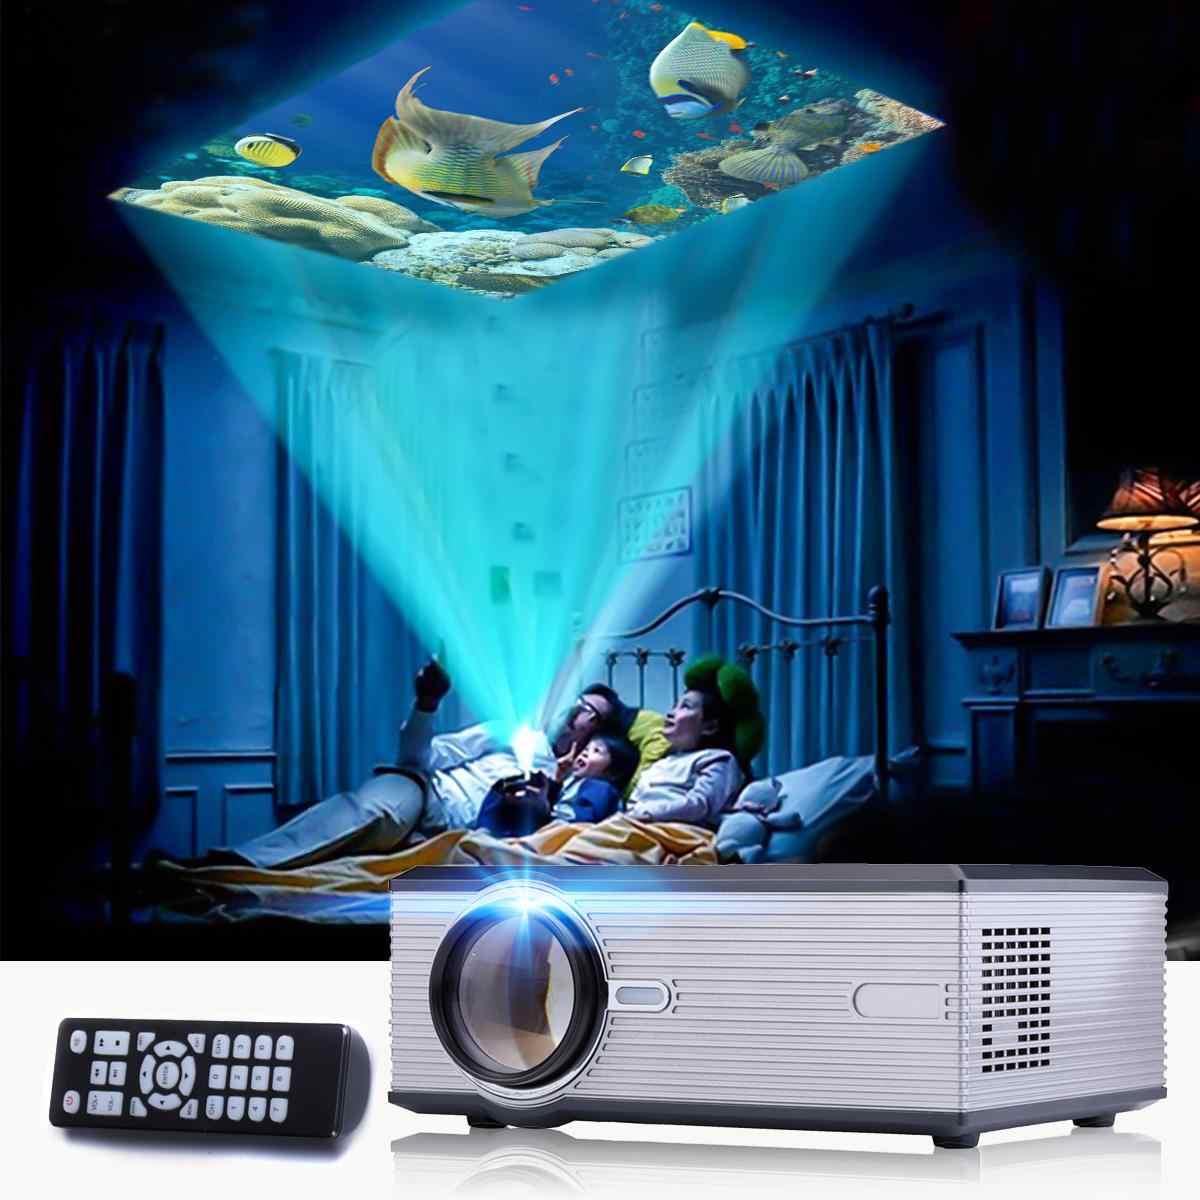 1080 P светодиодный Видеопроектор для дома ТЕАТР 7000 люмен Поддержка Full HD мини-проектор HDMI/USB/SD/AV/VGA дома кино